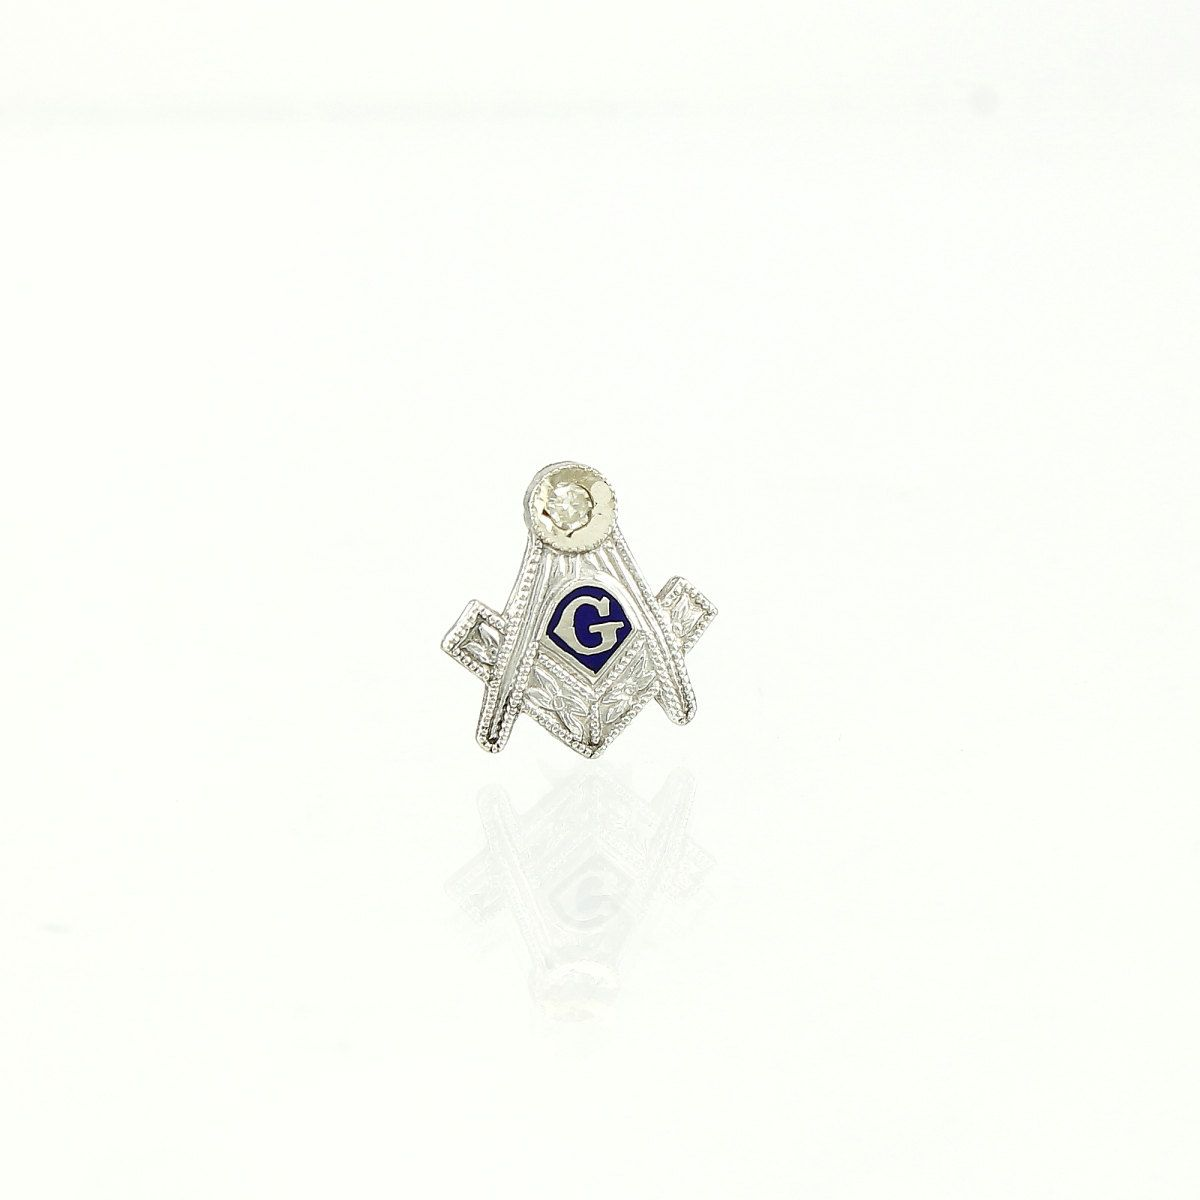 Masonic Pin - 14K Gold & Diamond Vintage | Vintage Masonry